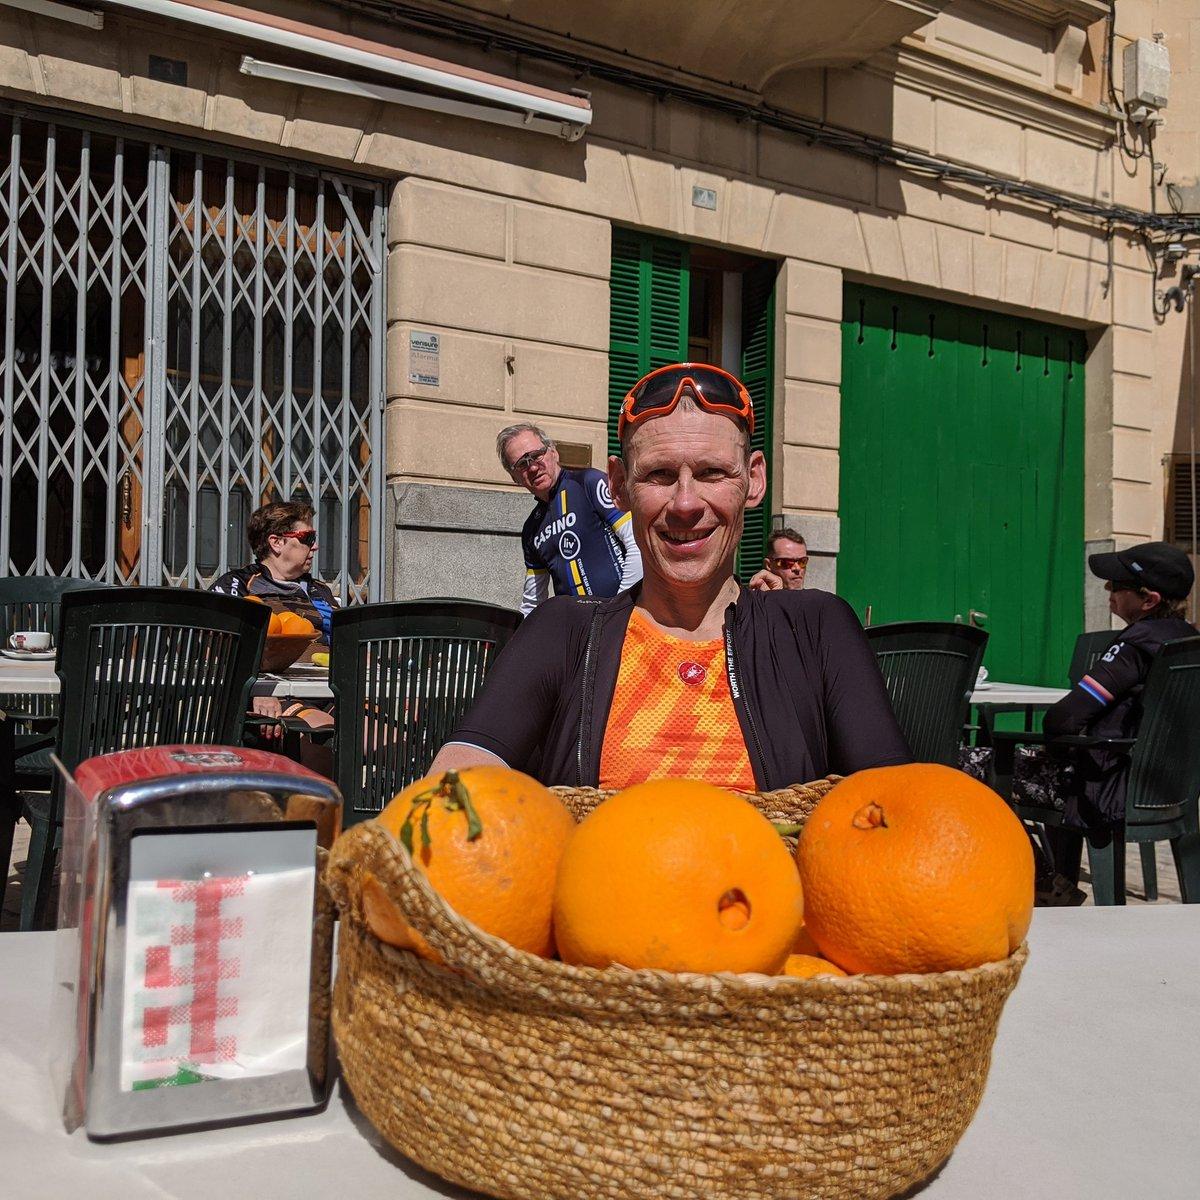 A bit of vitamin C and a bit of vitamin D #cycling #mallorca #mallorcacycling #stuarthallcyclingholidays #cyclingholidayspic.twitter.com/fGF4FyIuBb